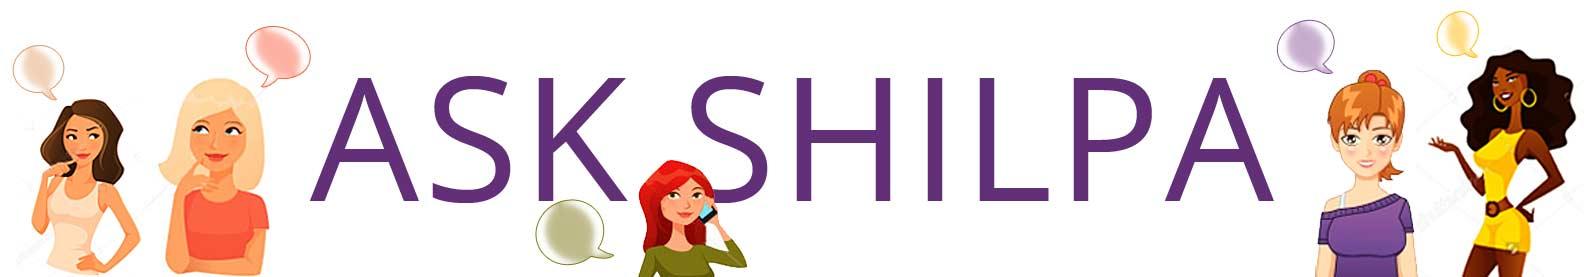 20-06-03---Ask-Shilpa-header